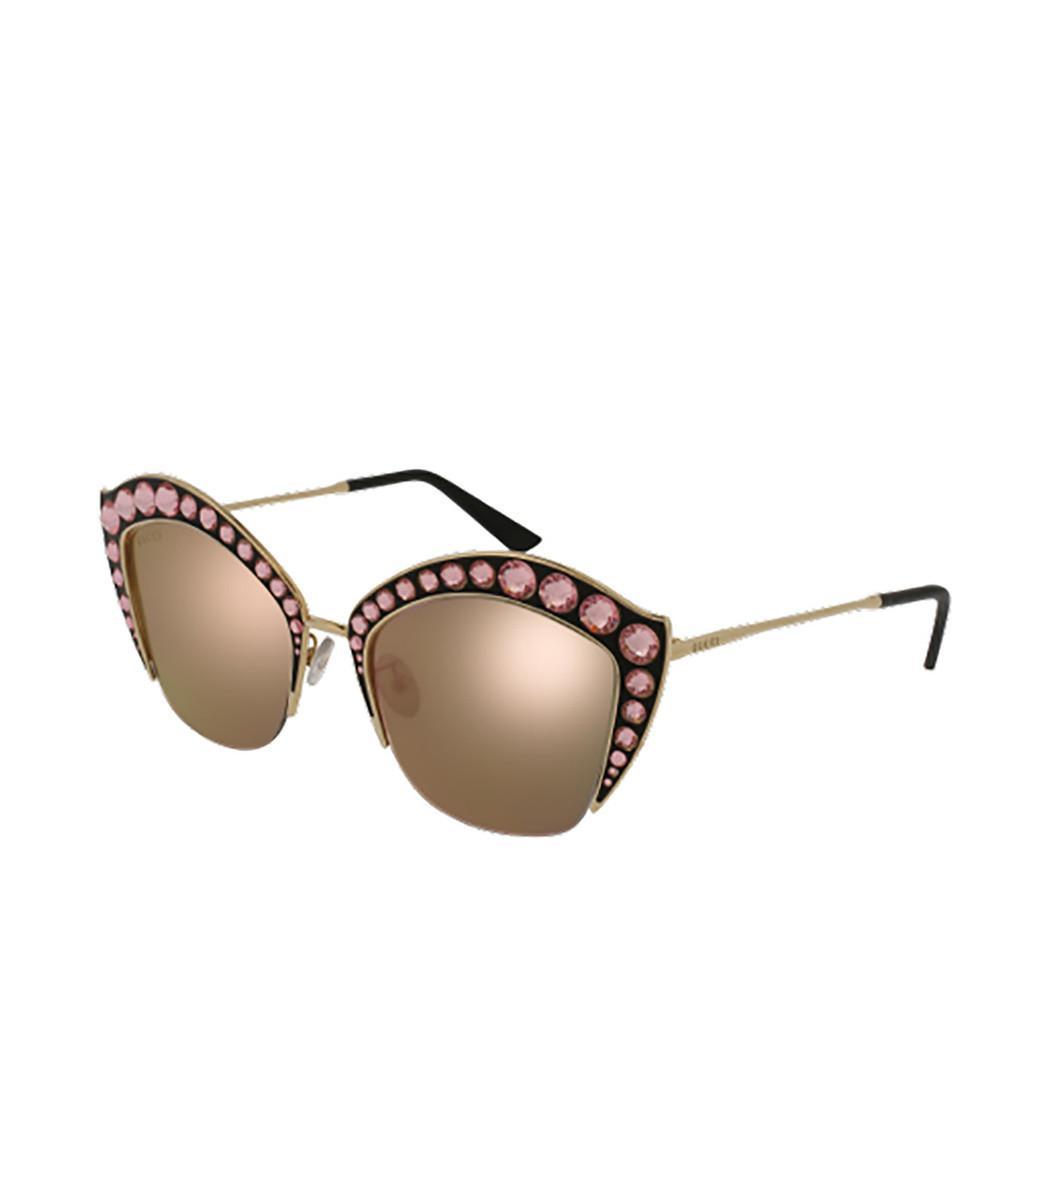 a76c5bd1675 Gucci - Metallic Gold silver Cat Eye Swarovski Sunglasses - Lyst. View  fullscreen